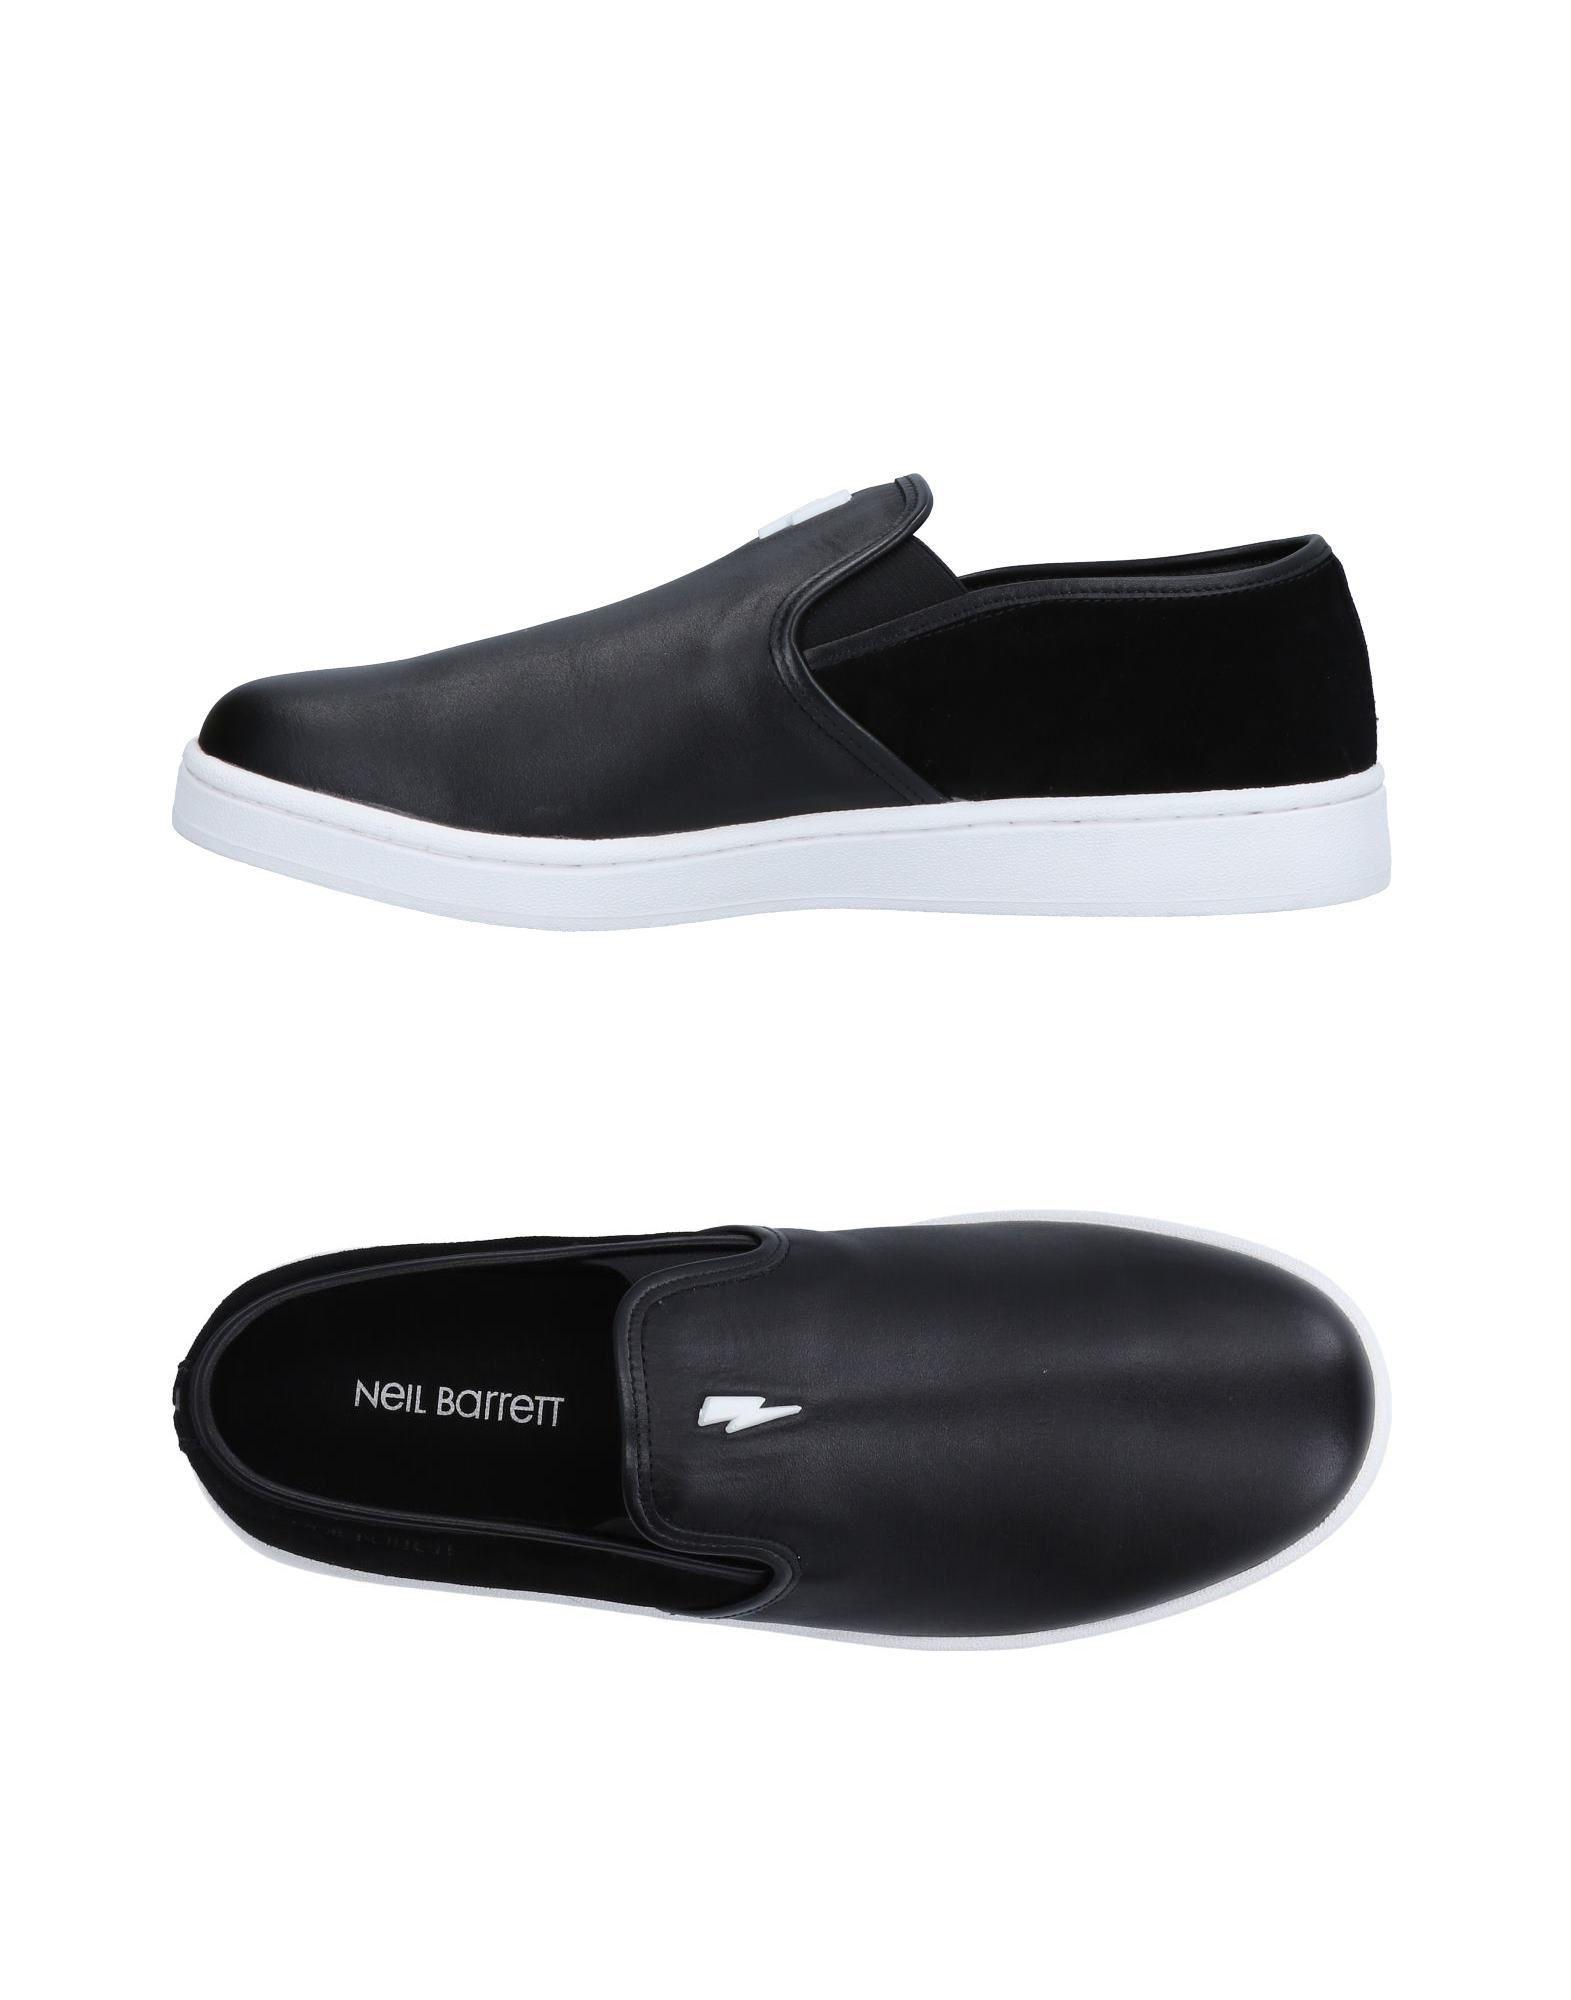 Neil Barrett Sneakers Herren  11522199KK Gute Qualität beliebte Schuhe